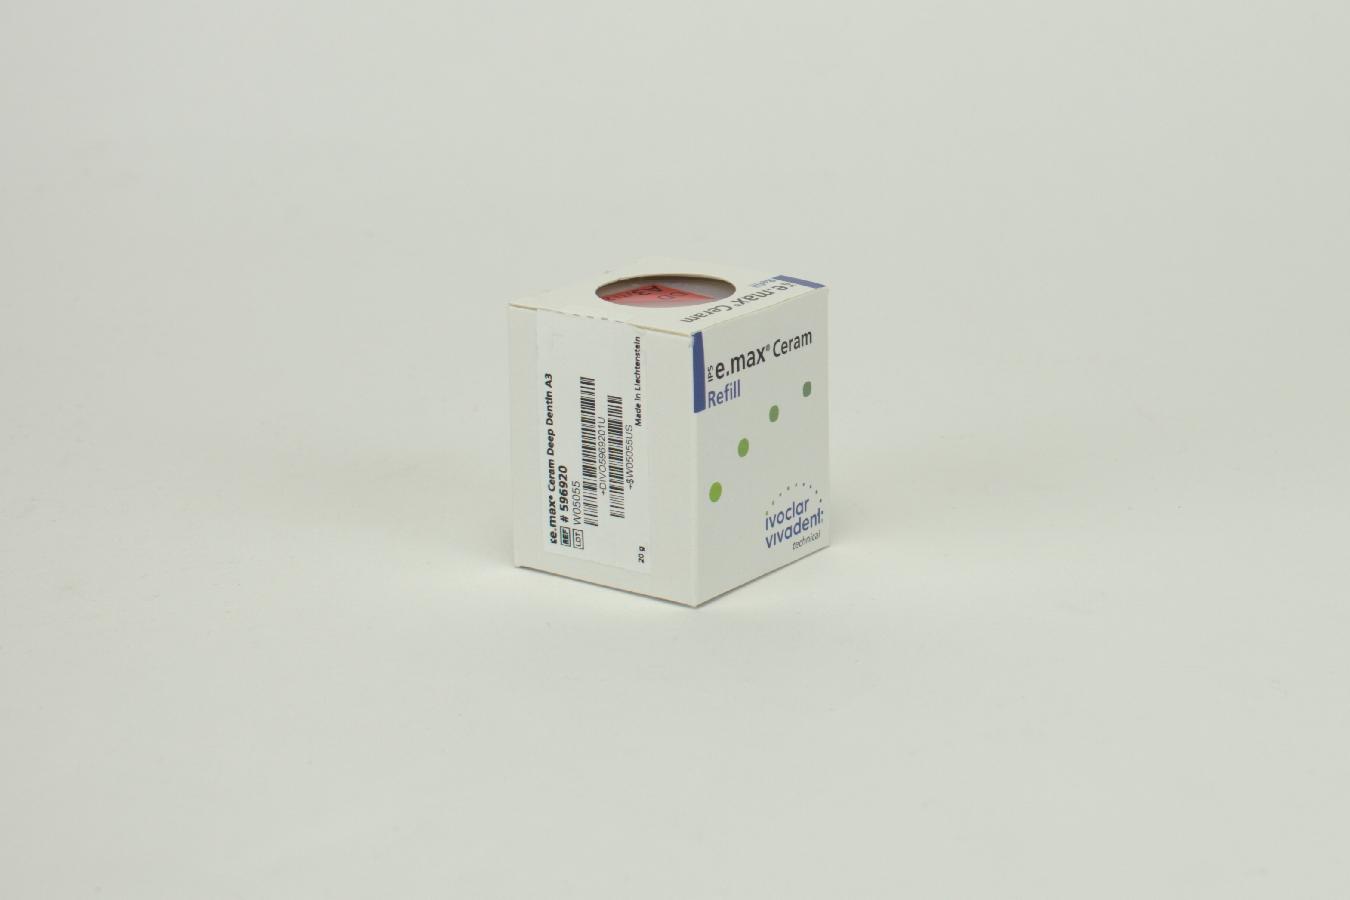 IPS e.max Ceram Deep Dentin A3 20g